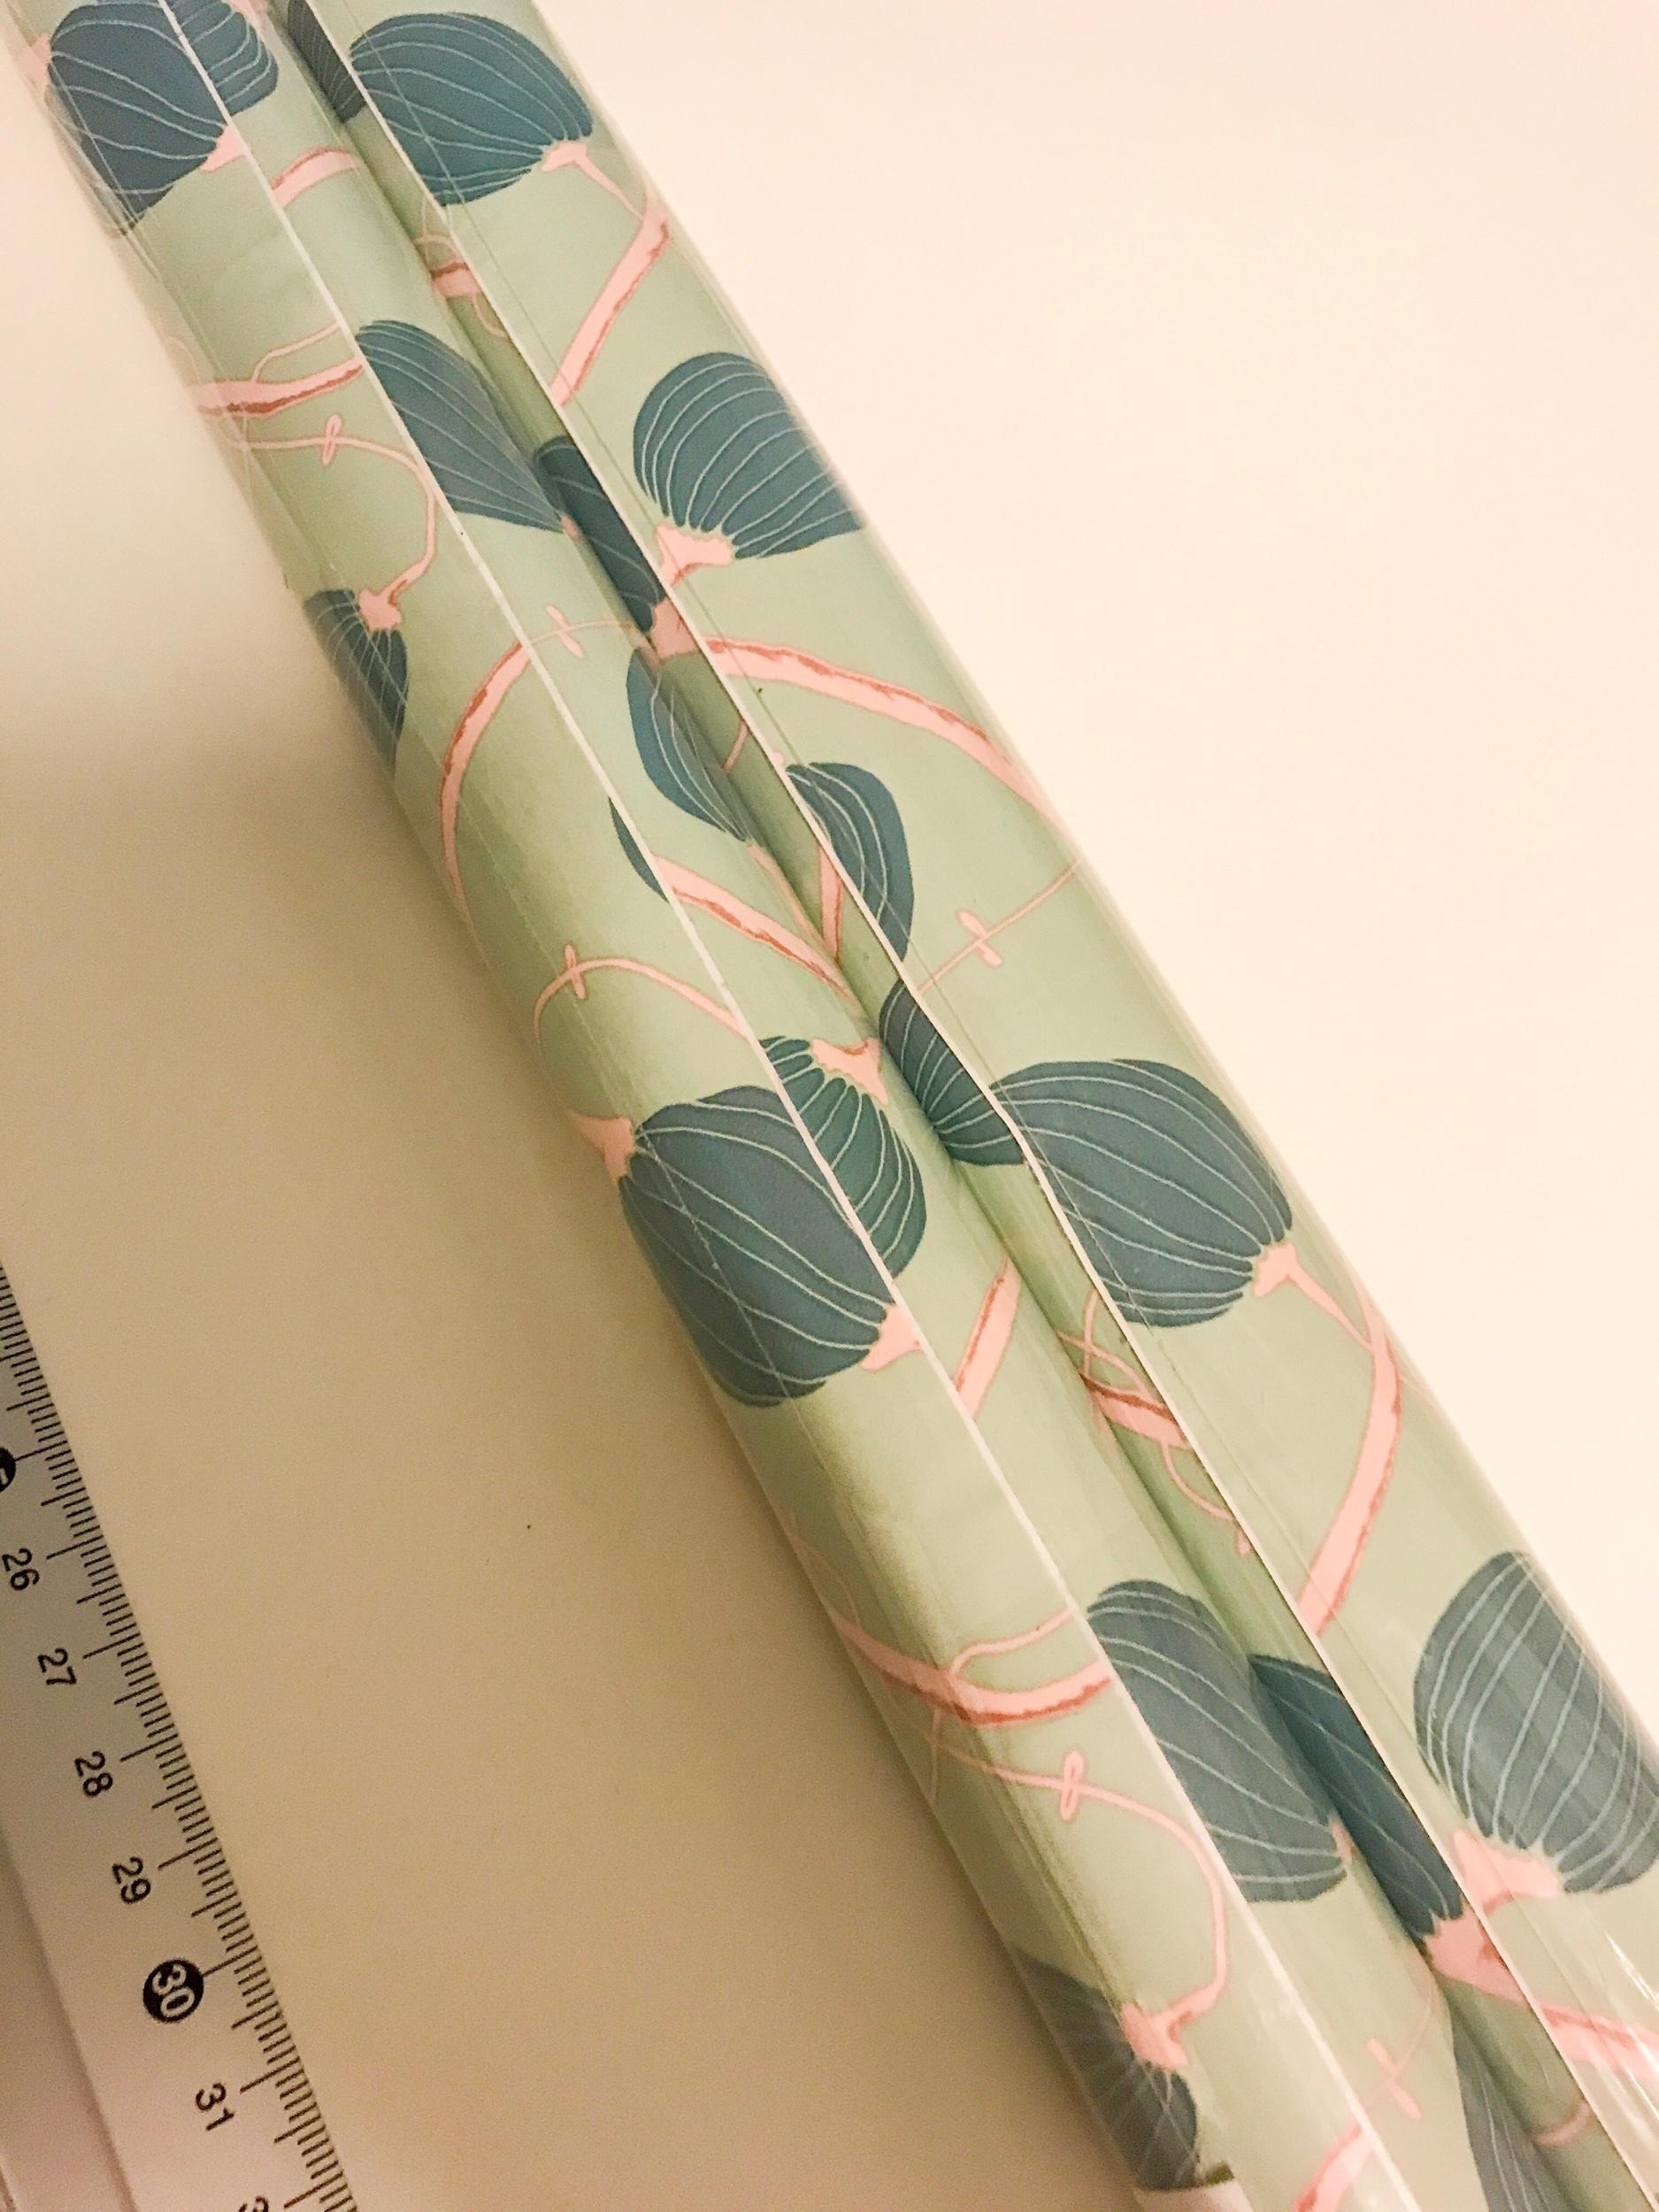 sostrene grene self-adhesive decorative paper.